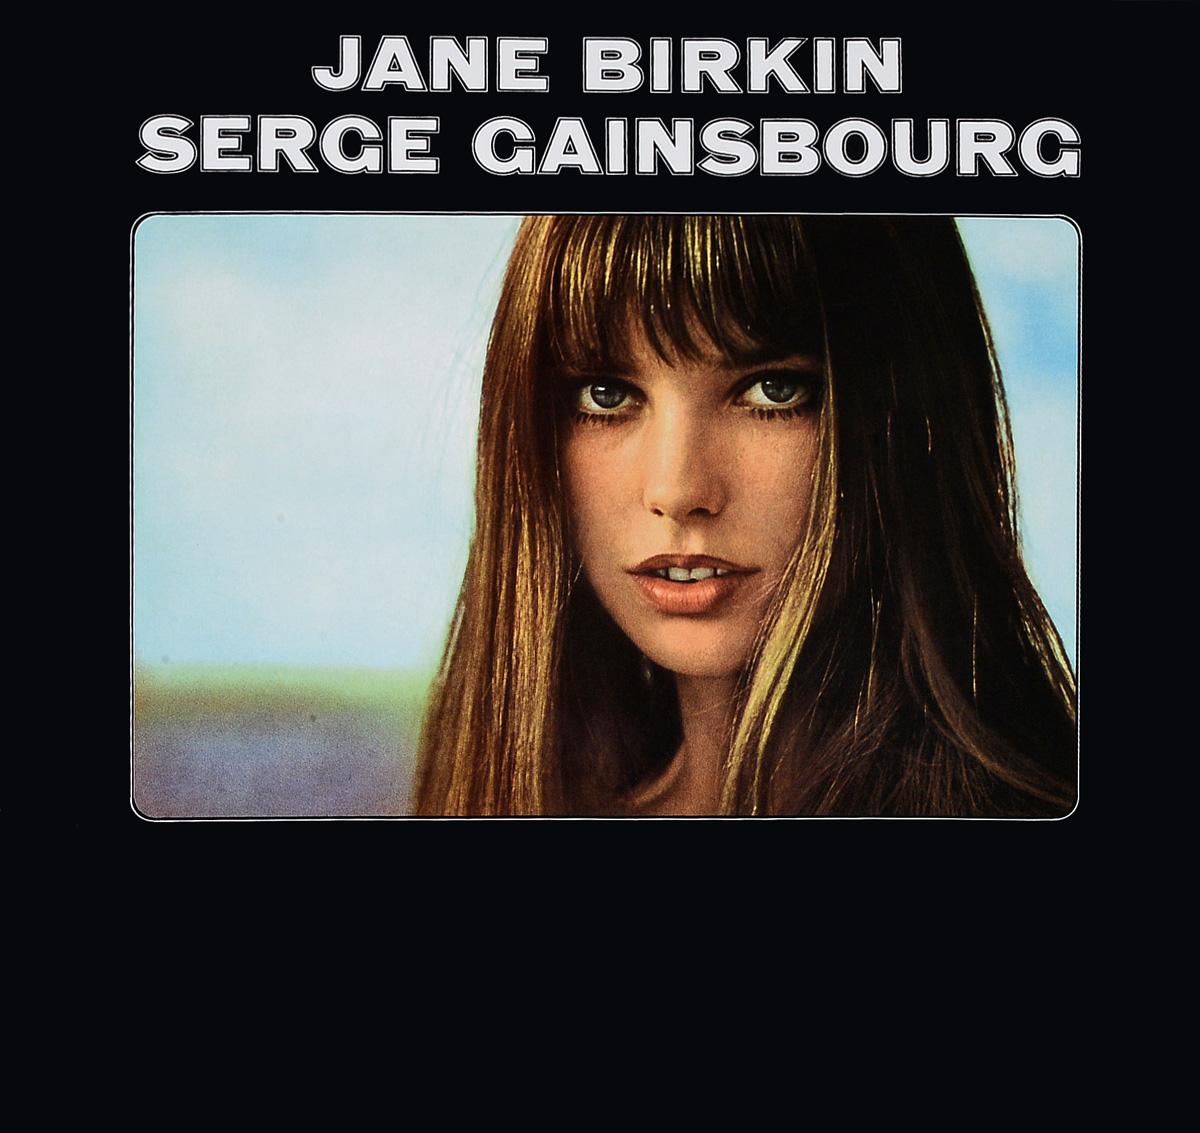 Zakazat.ru: Serge Gainsbourg & Jane Birkin. Jane Birkin - Serge Gainsbourg (LP)